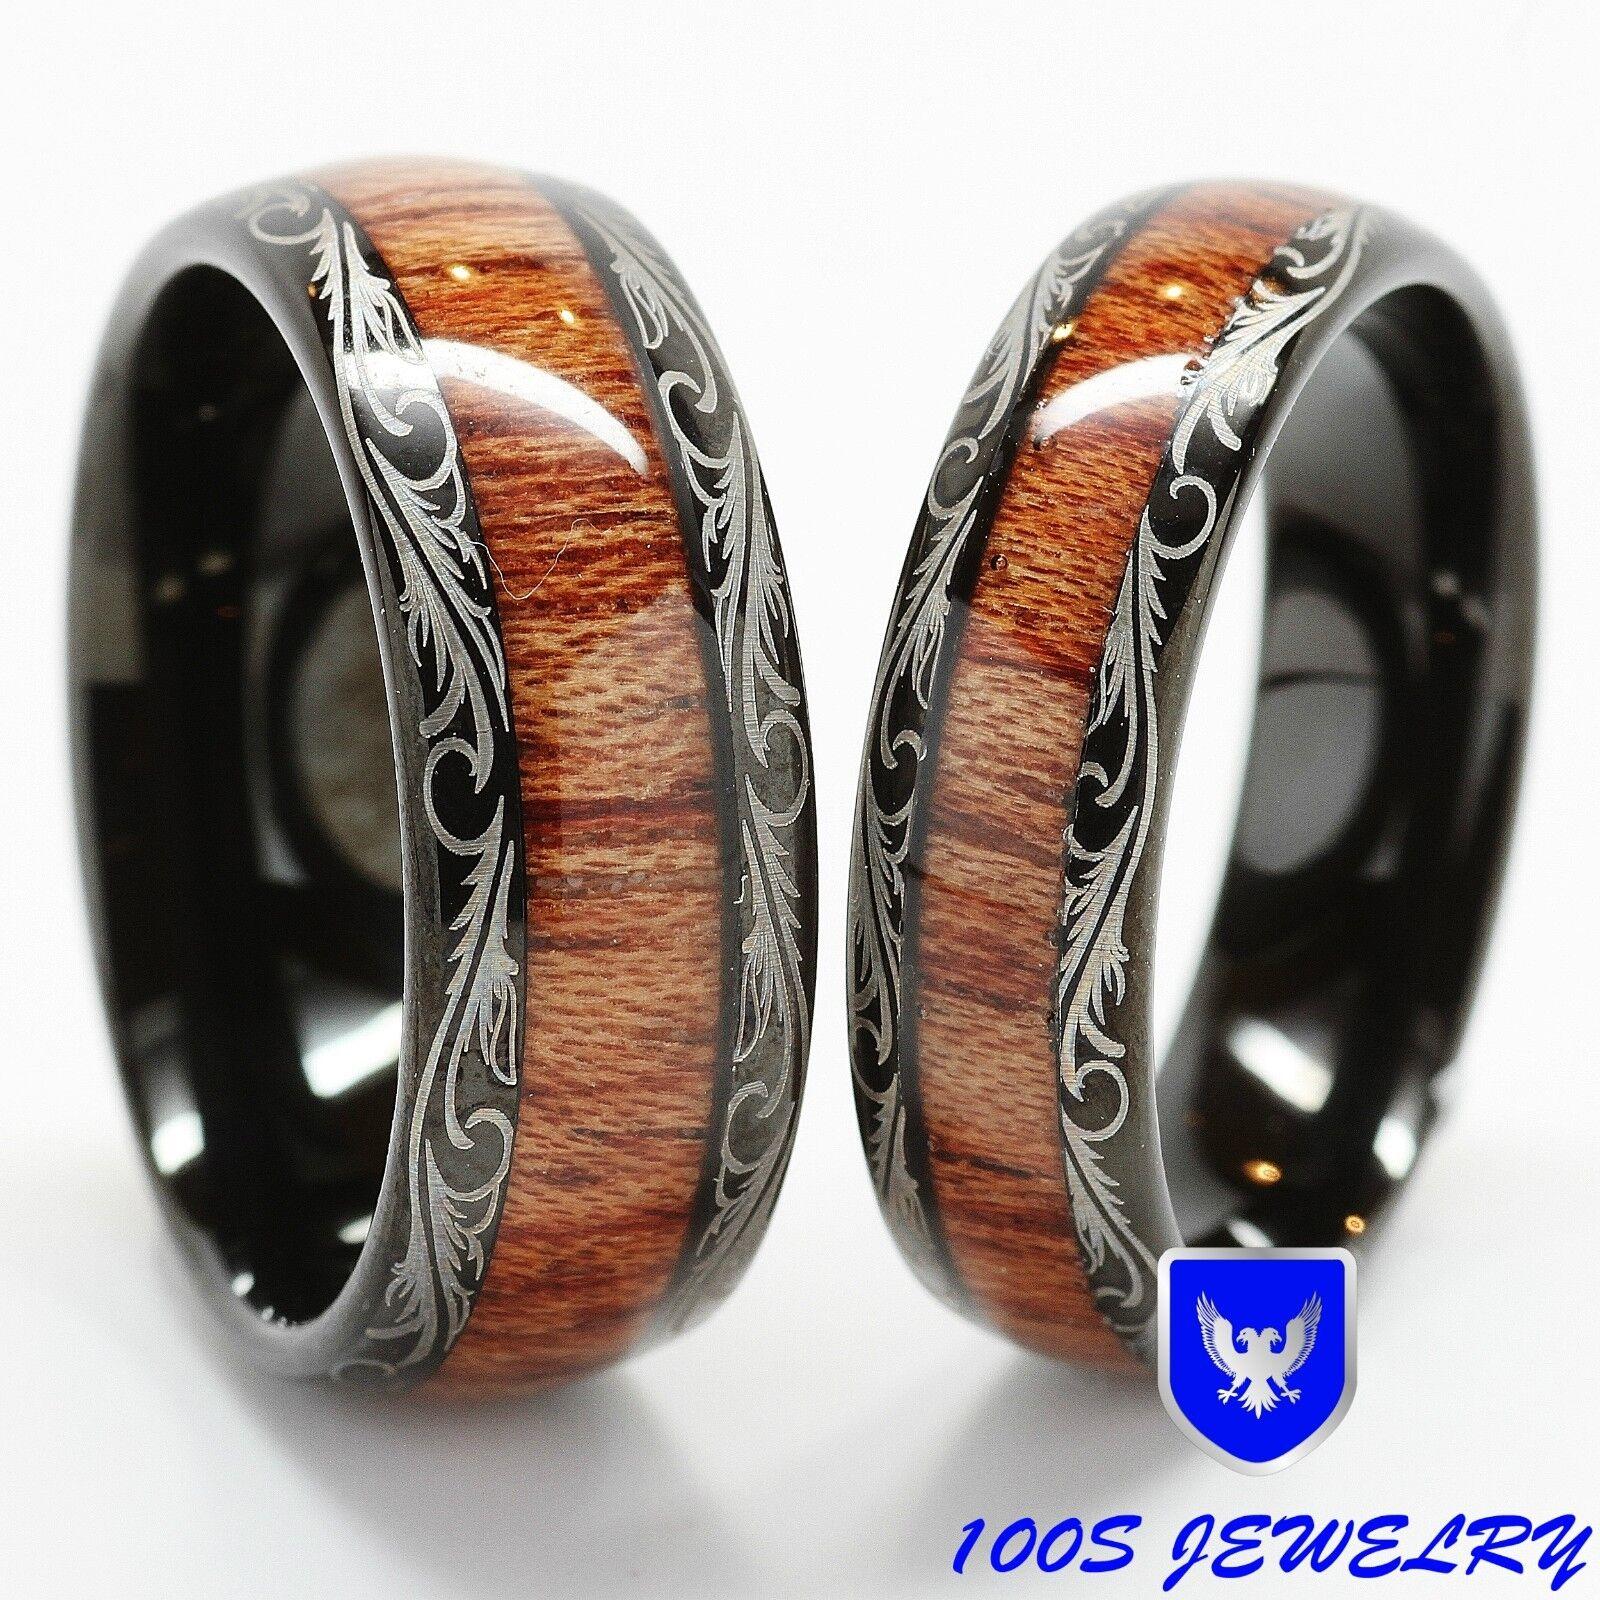 men & women's tungsten carbide wedding band wood inlay comfort fit